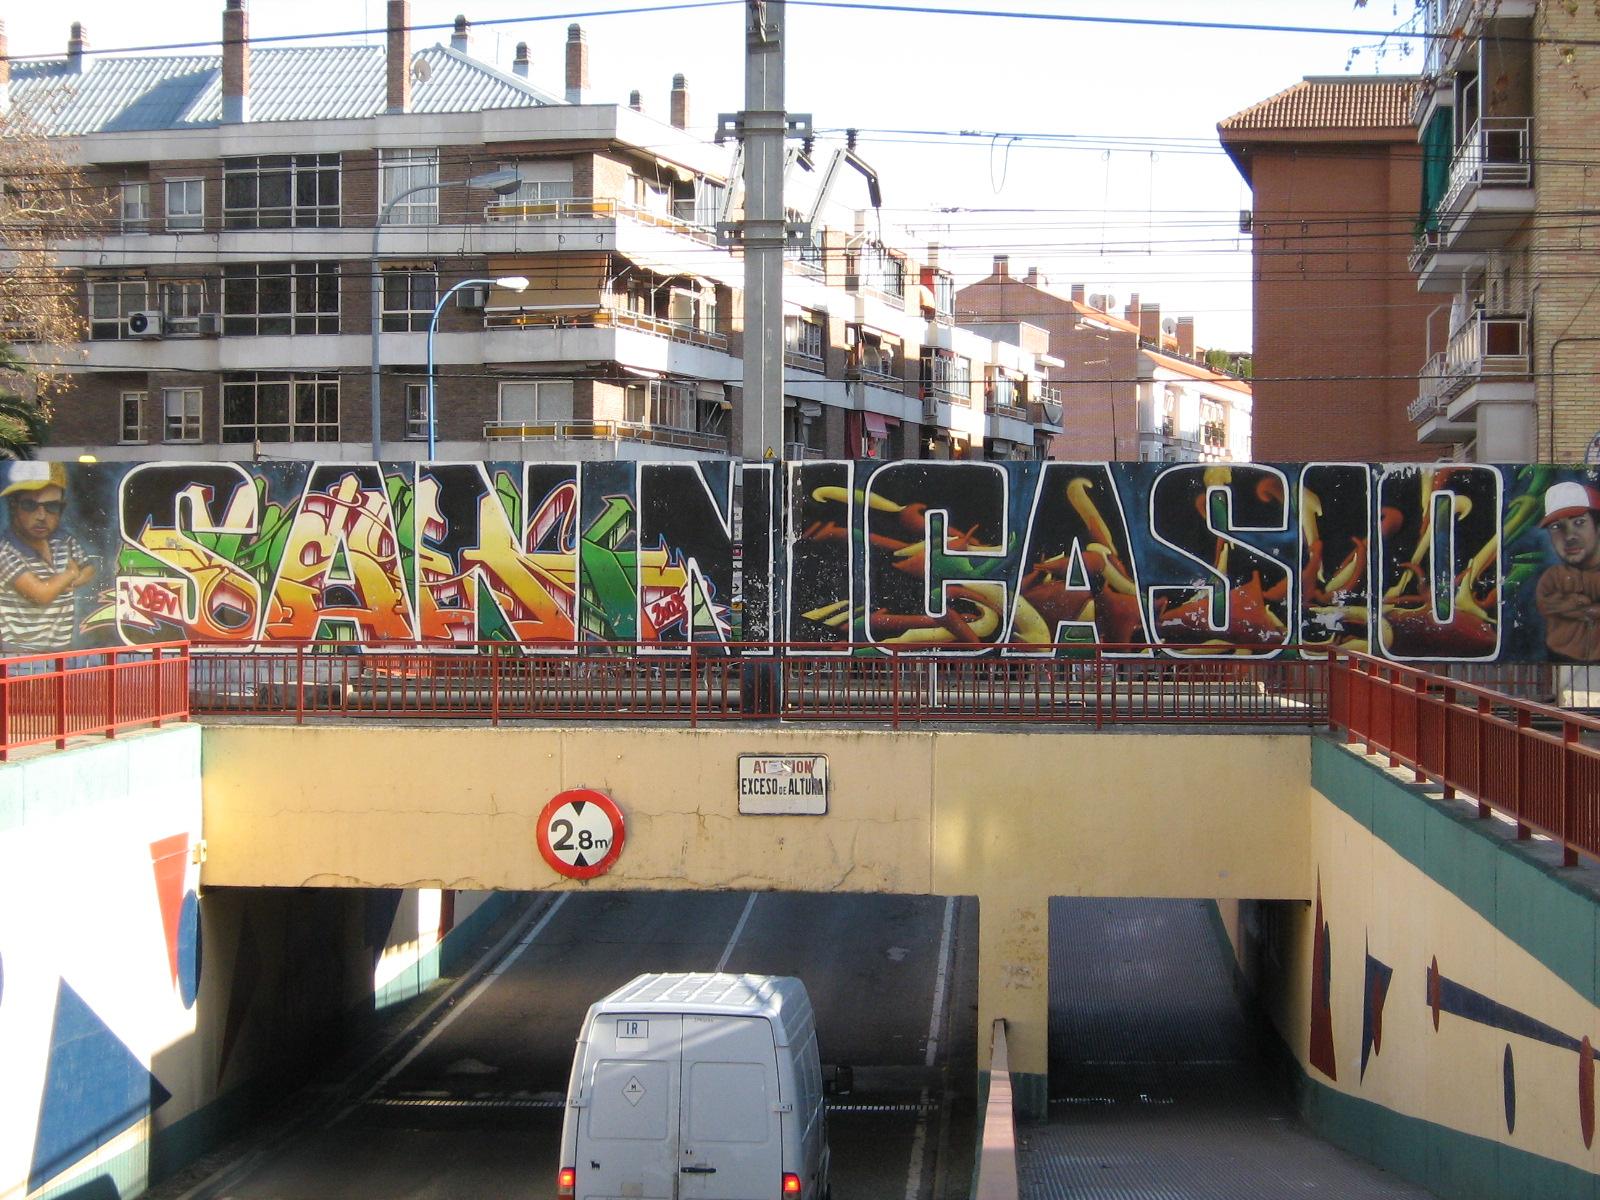 Avv San Nicasio